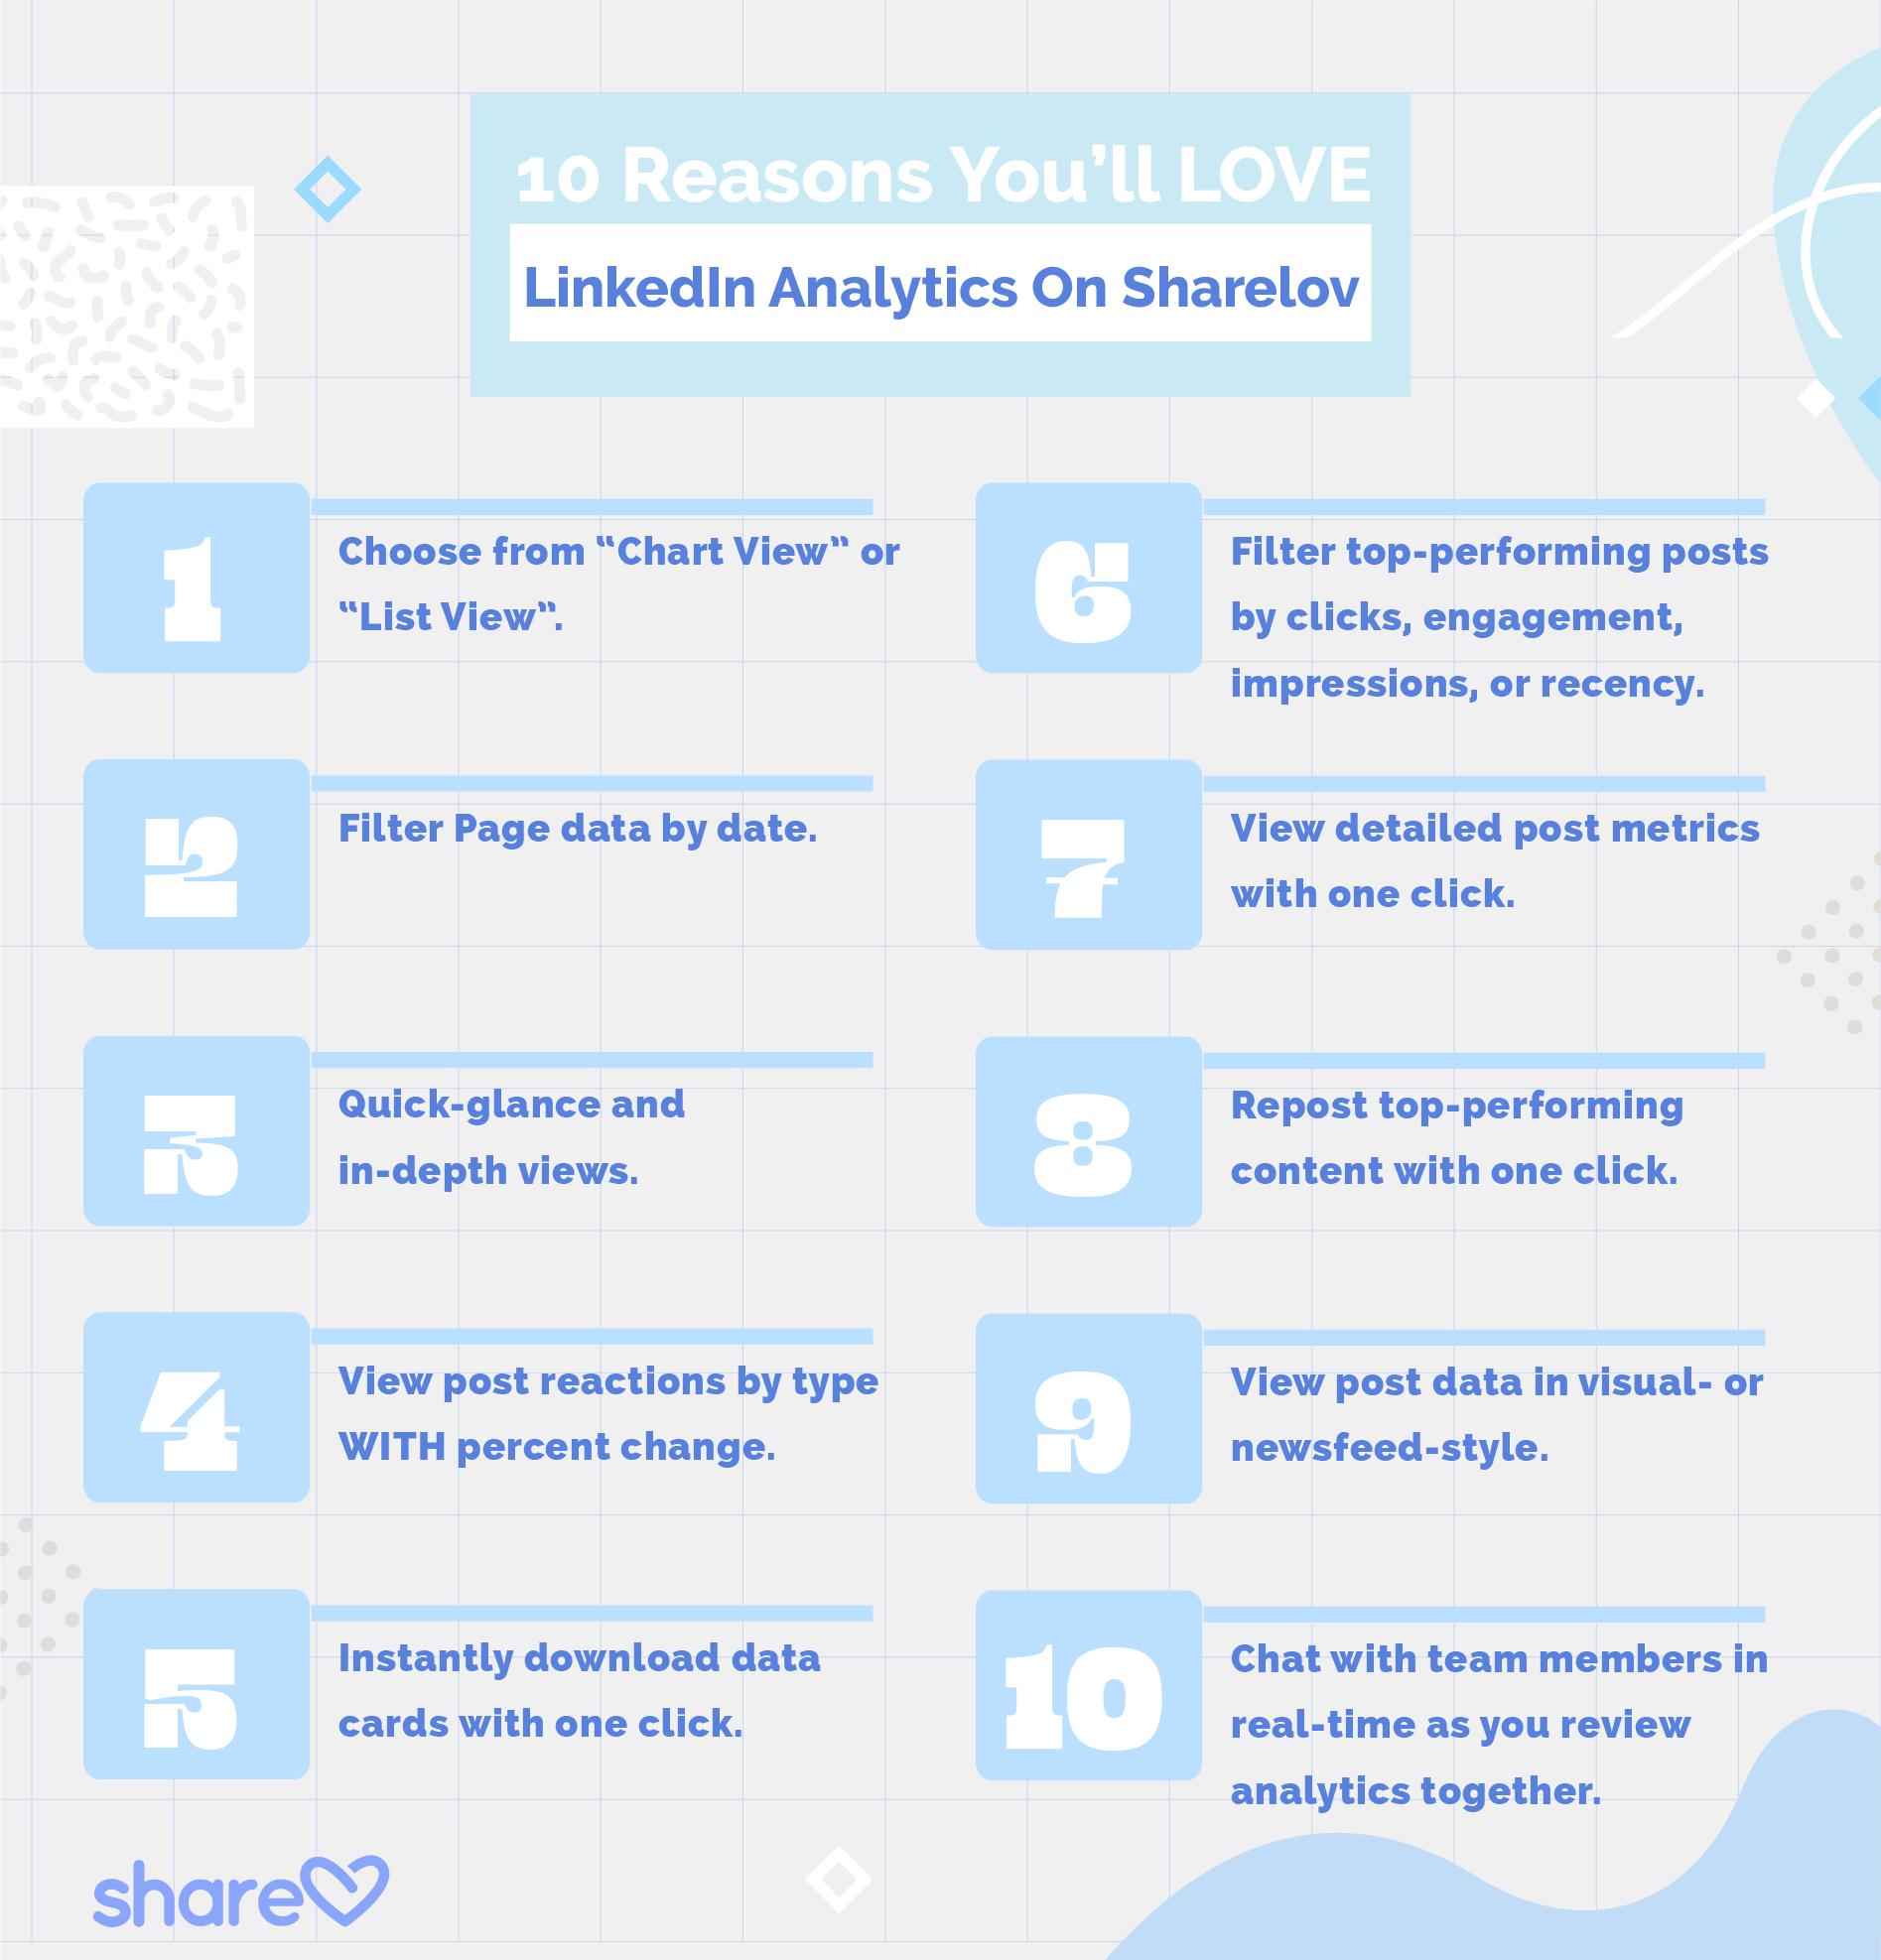 10 reasons you'll love LinkedIn Analytics on Sharelov